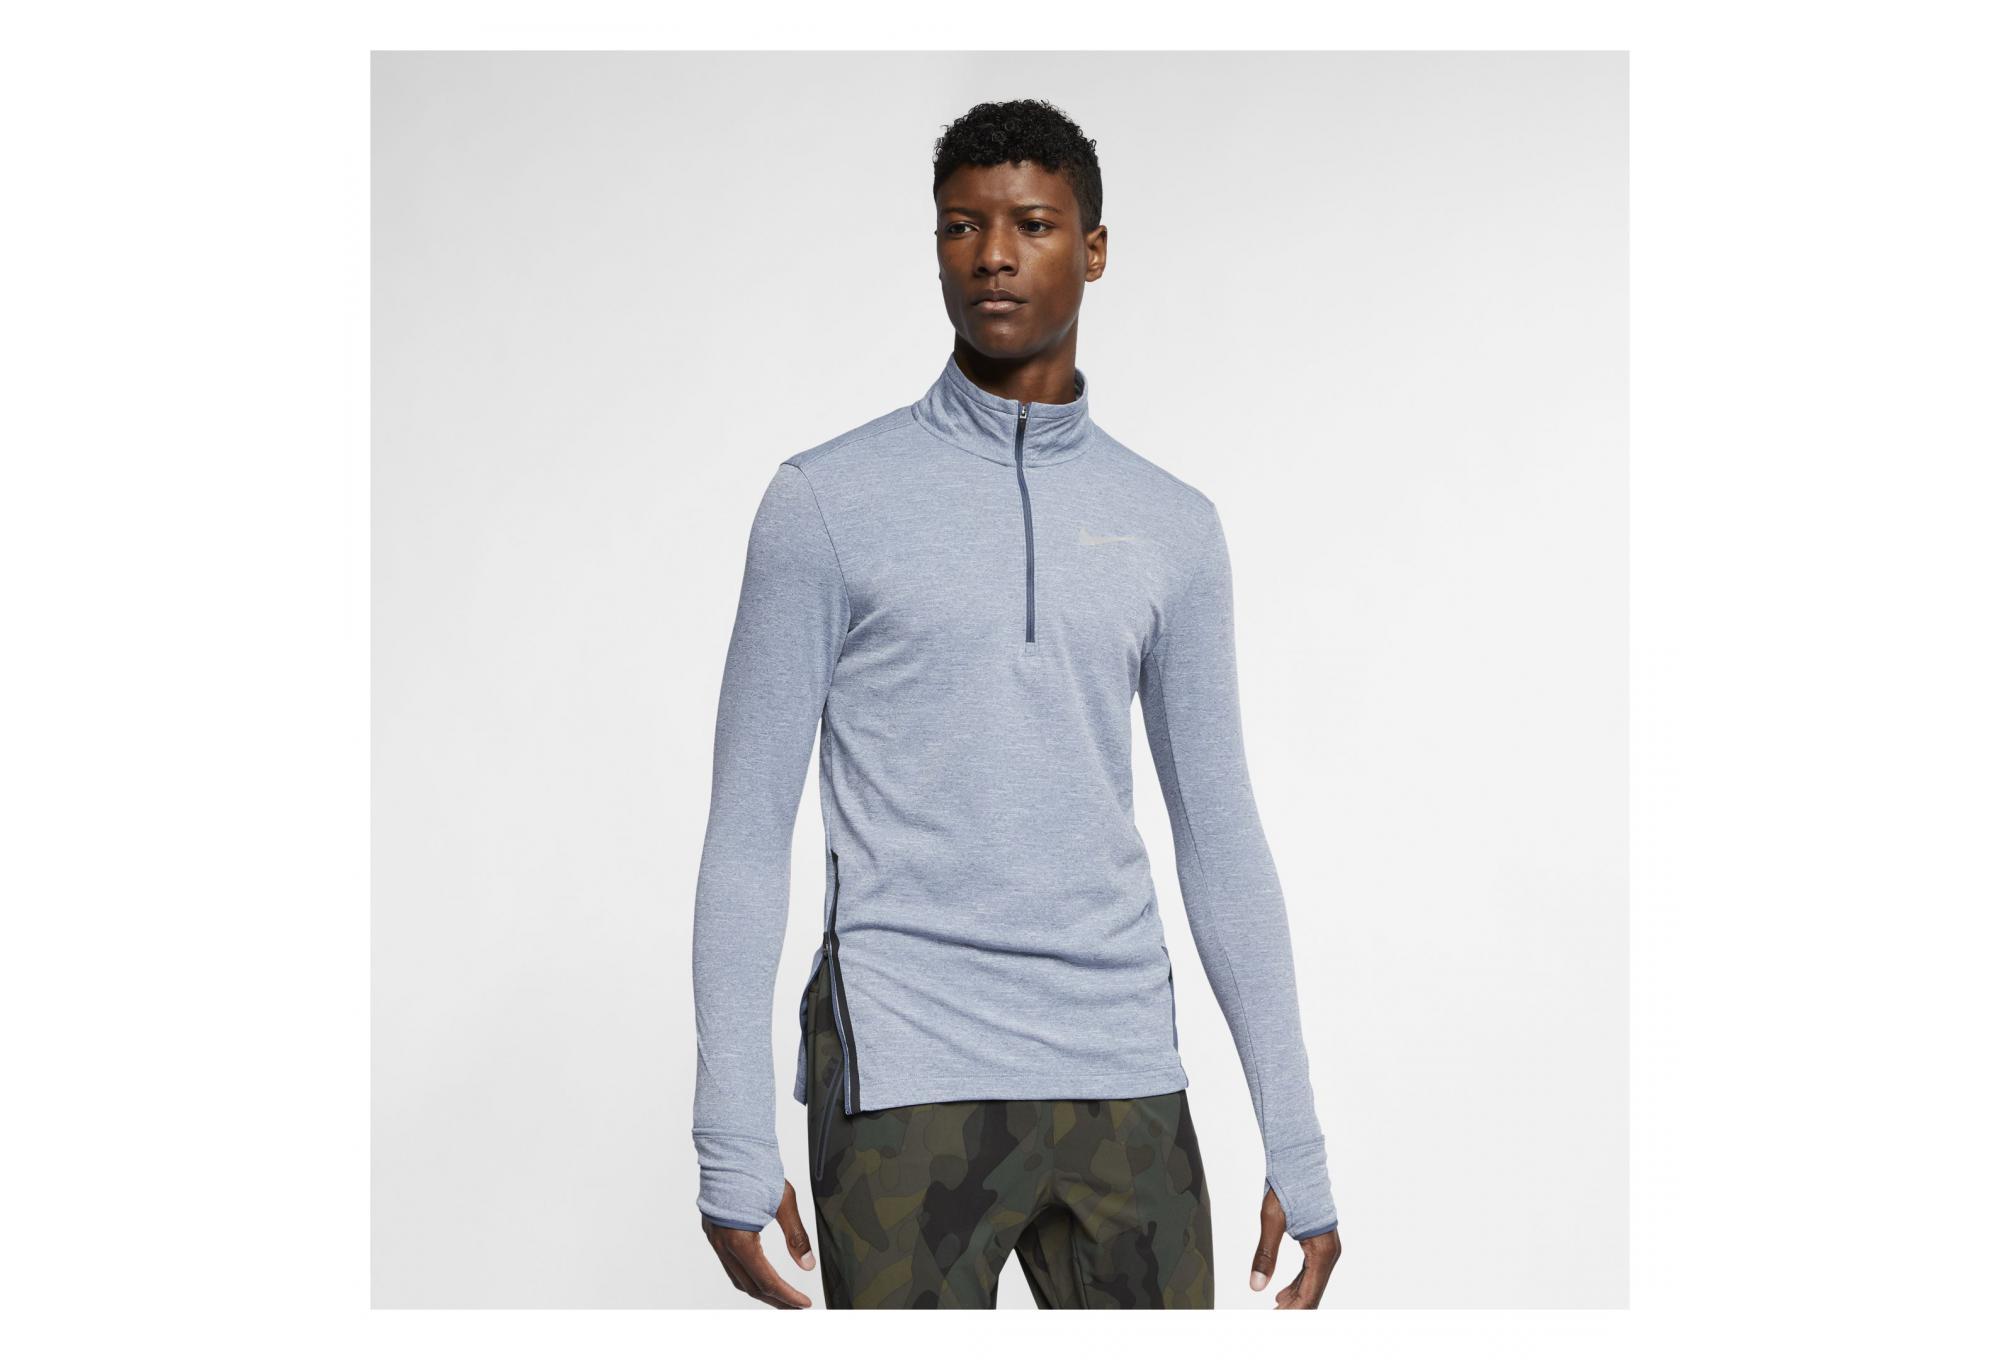 Homme Zip Pull Bleu Sphere Shqdtrc Element Nike 14 TF15JuK3lc